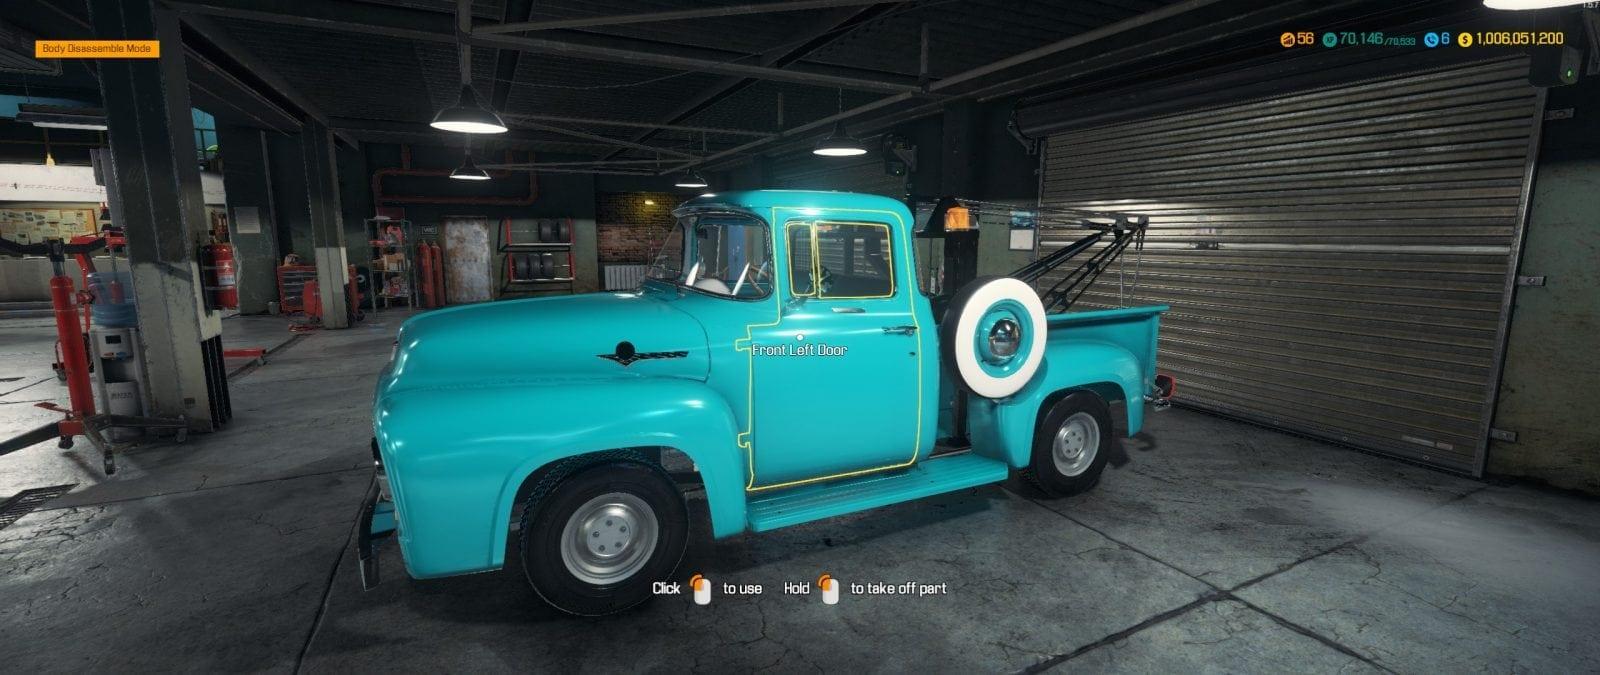 1956 Ford F100 Mod for Car Mechanic Simulator 2018